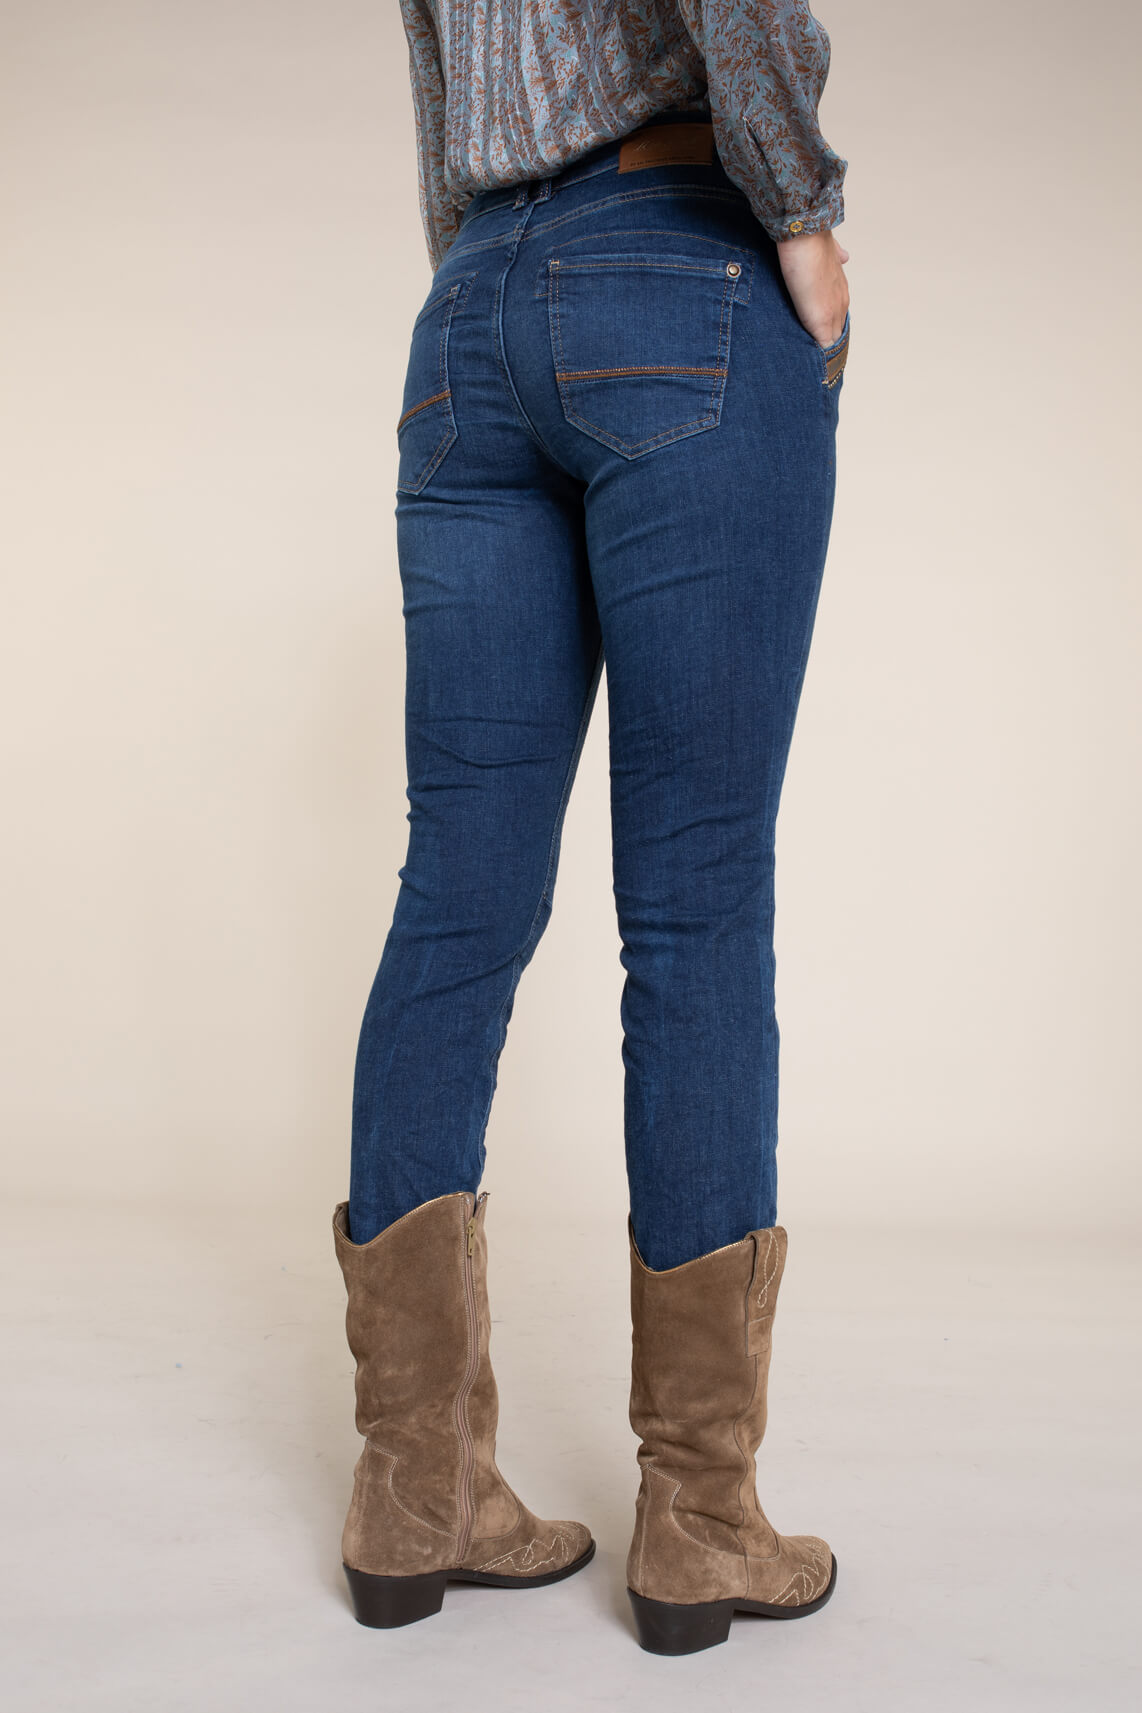 Mos Mosh Dames Etta jeans Blauw